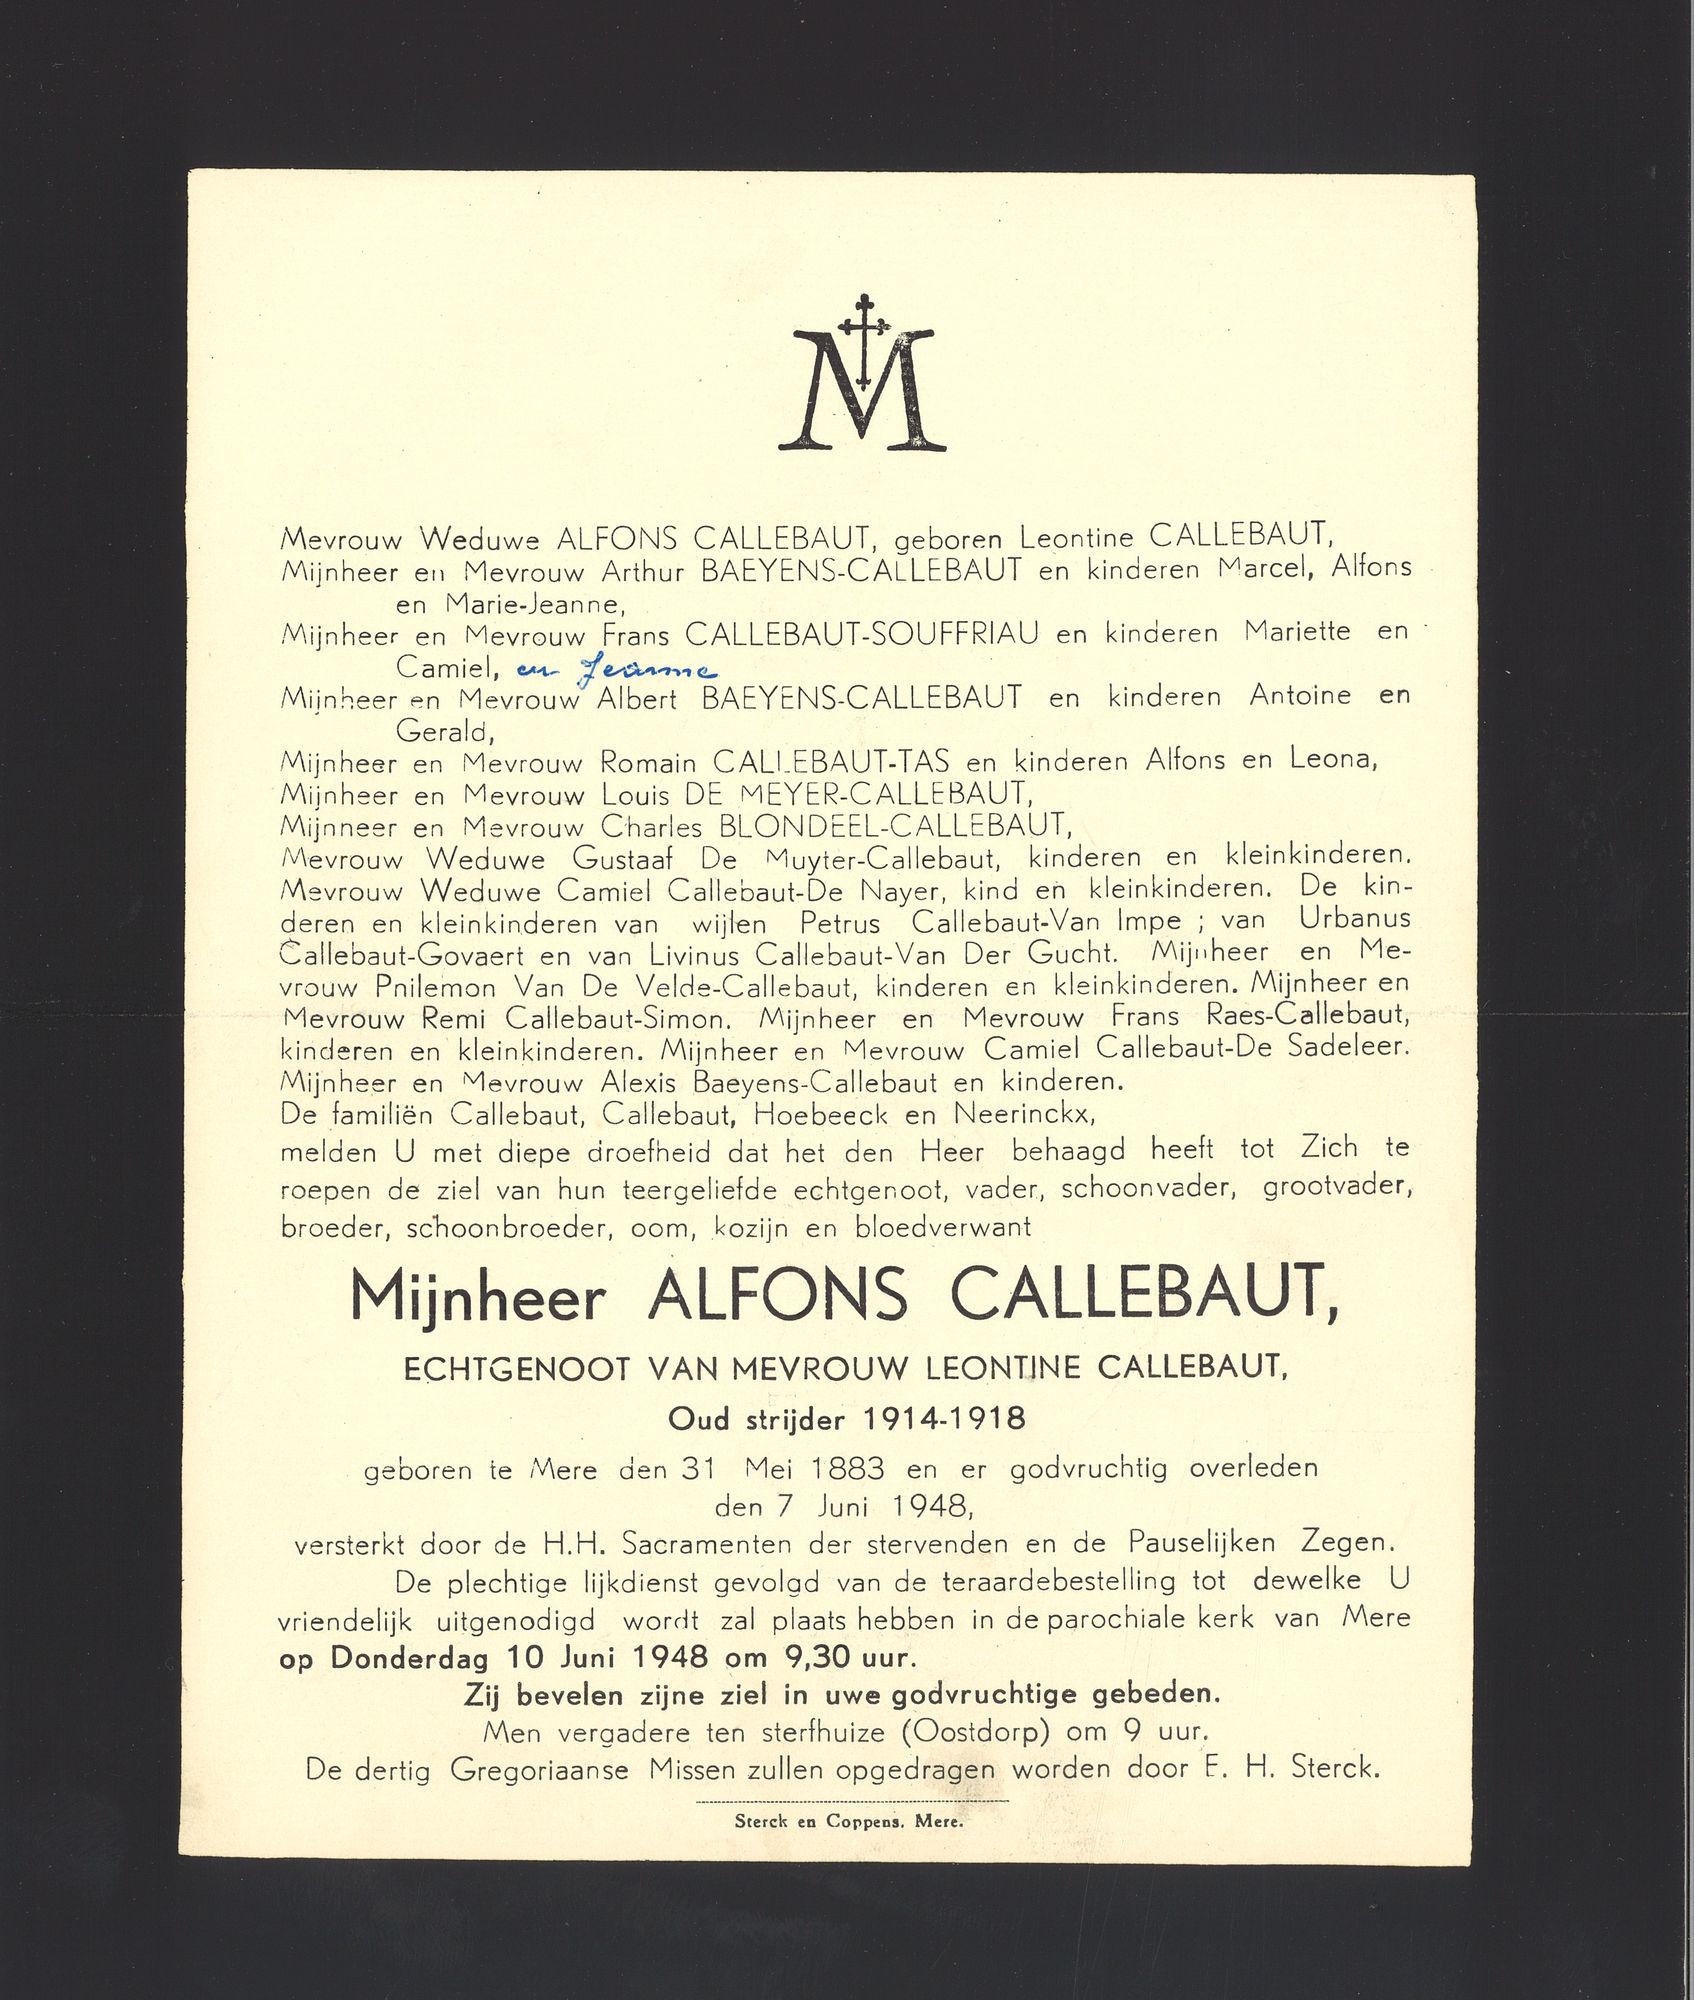 Alfons Callebaut